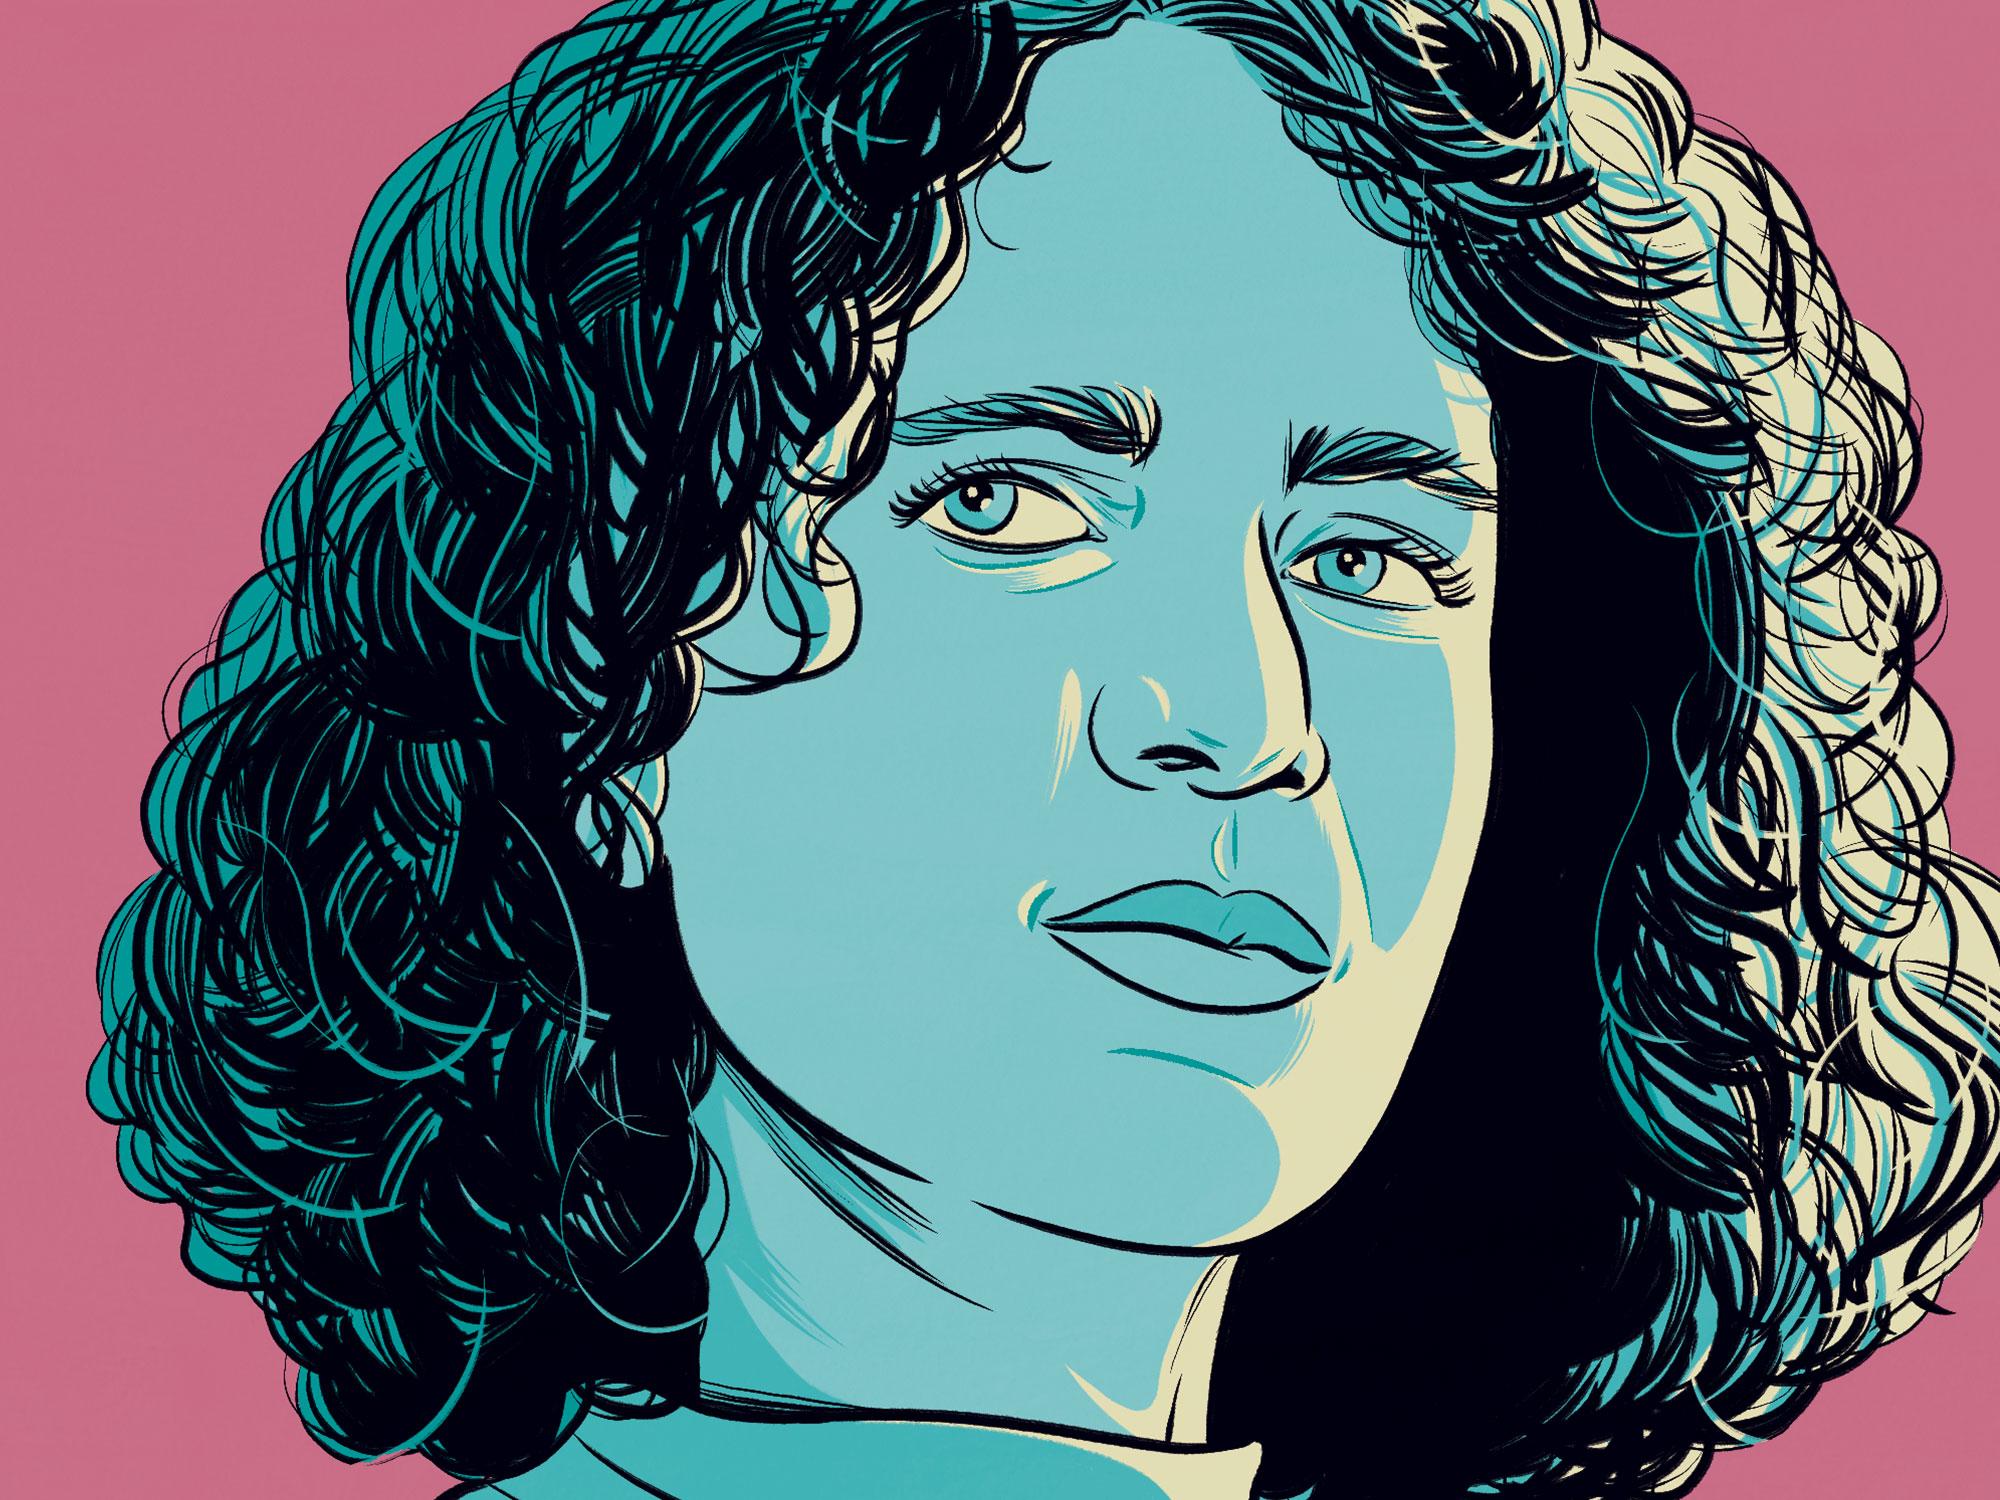 Mati Diop illustrated portrait